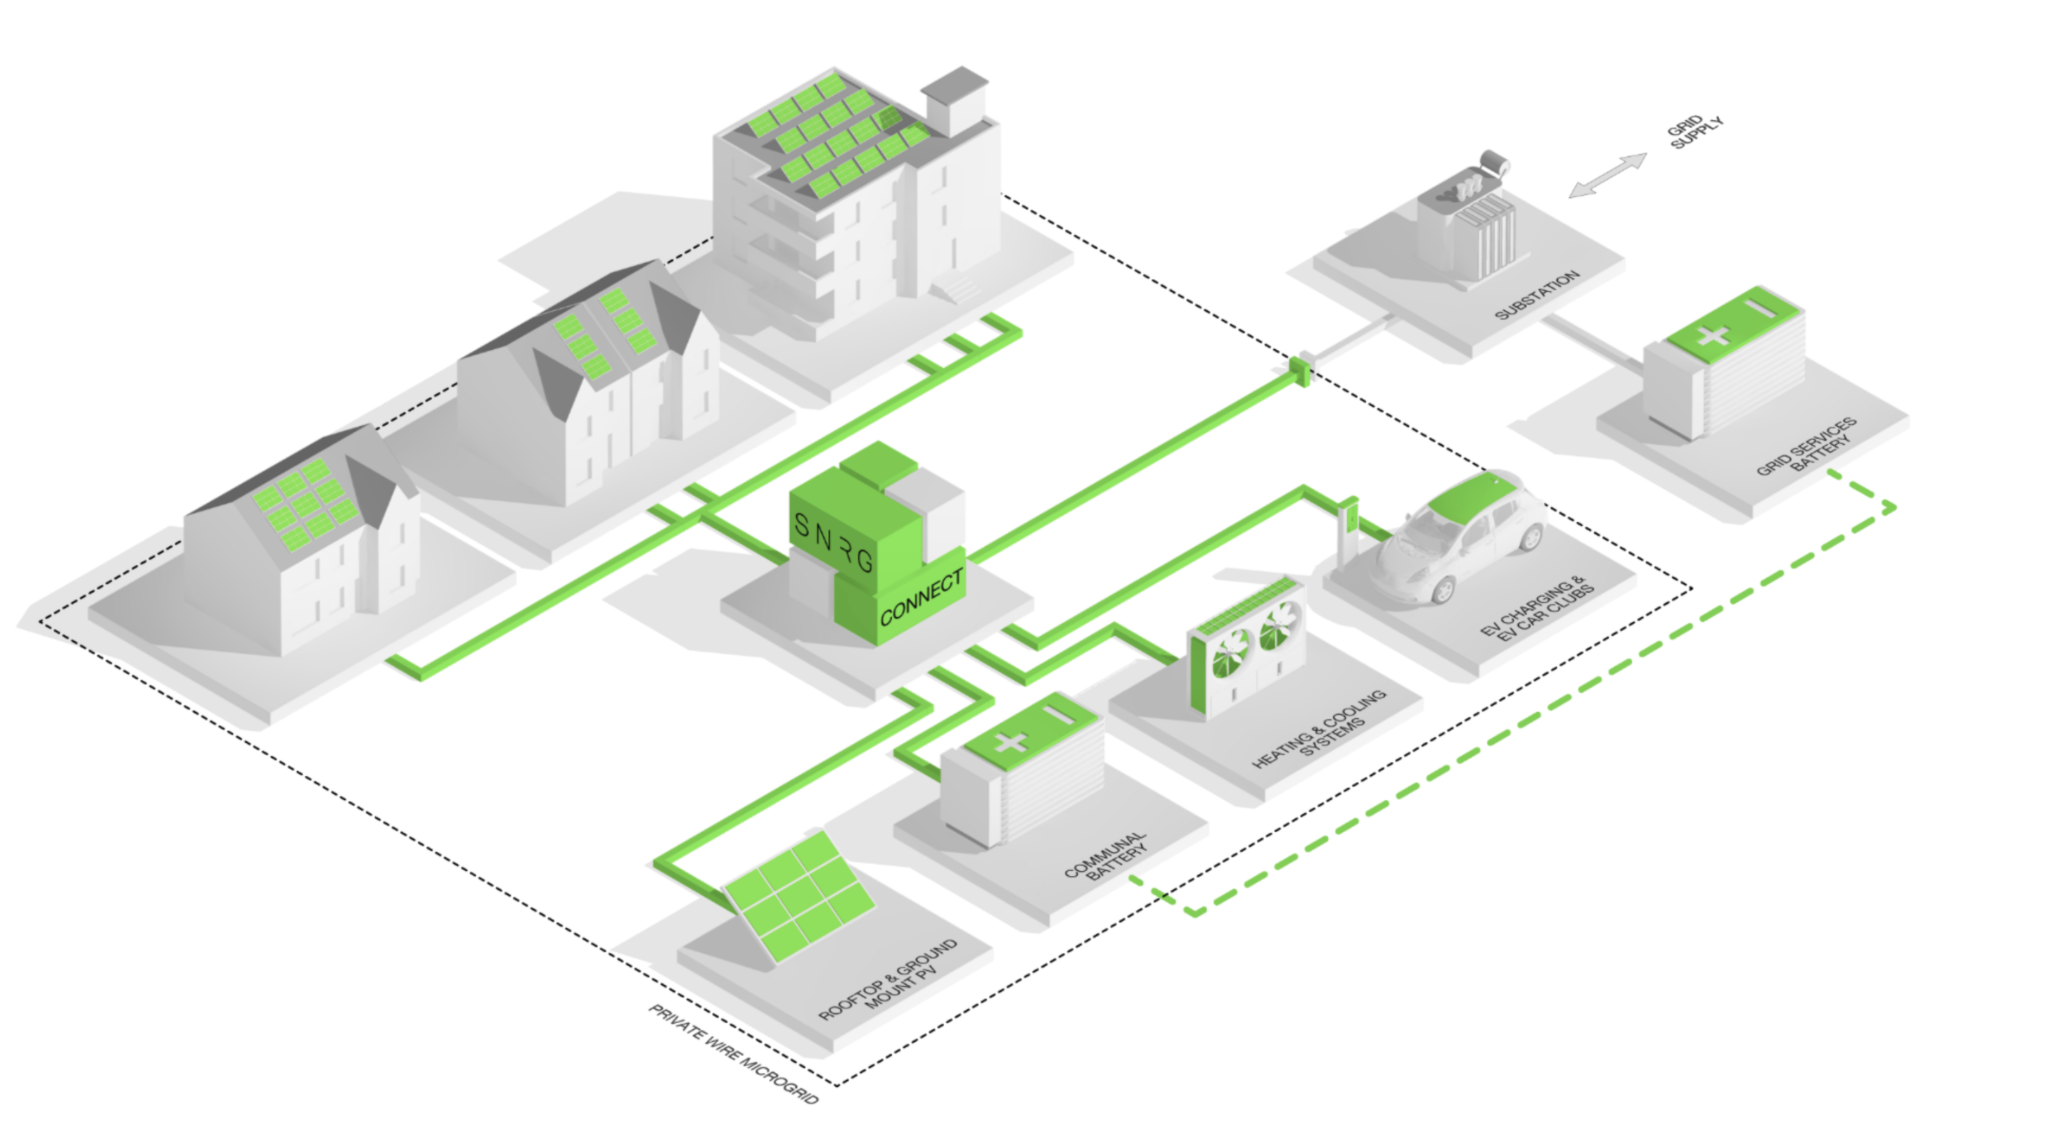 SNRG and Australian start-up expand UK microgrid market